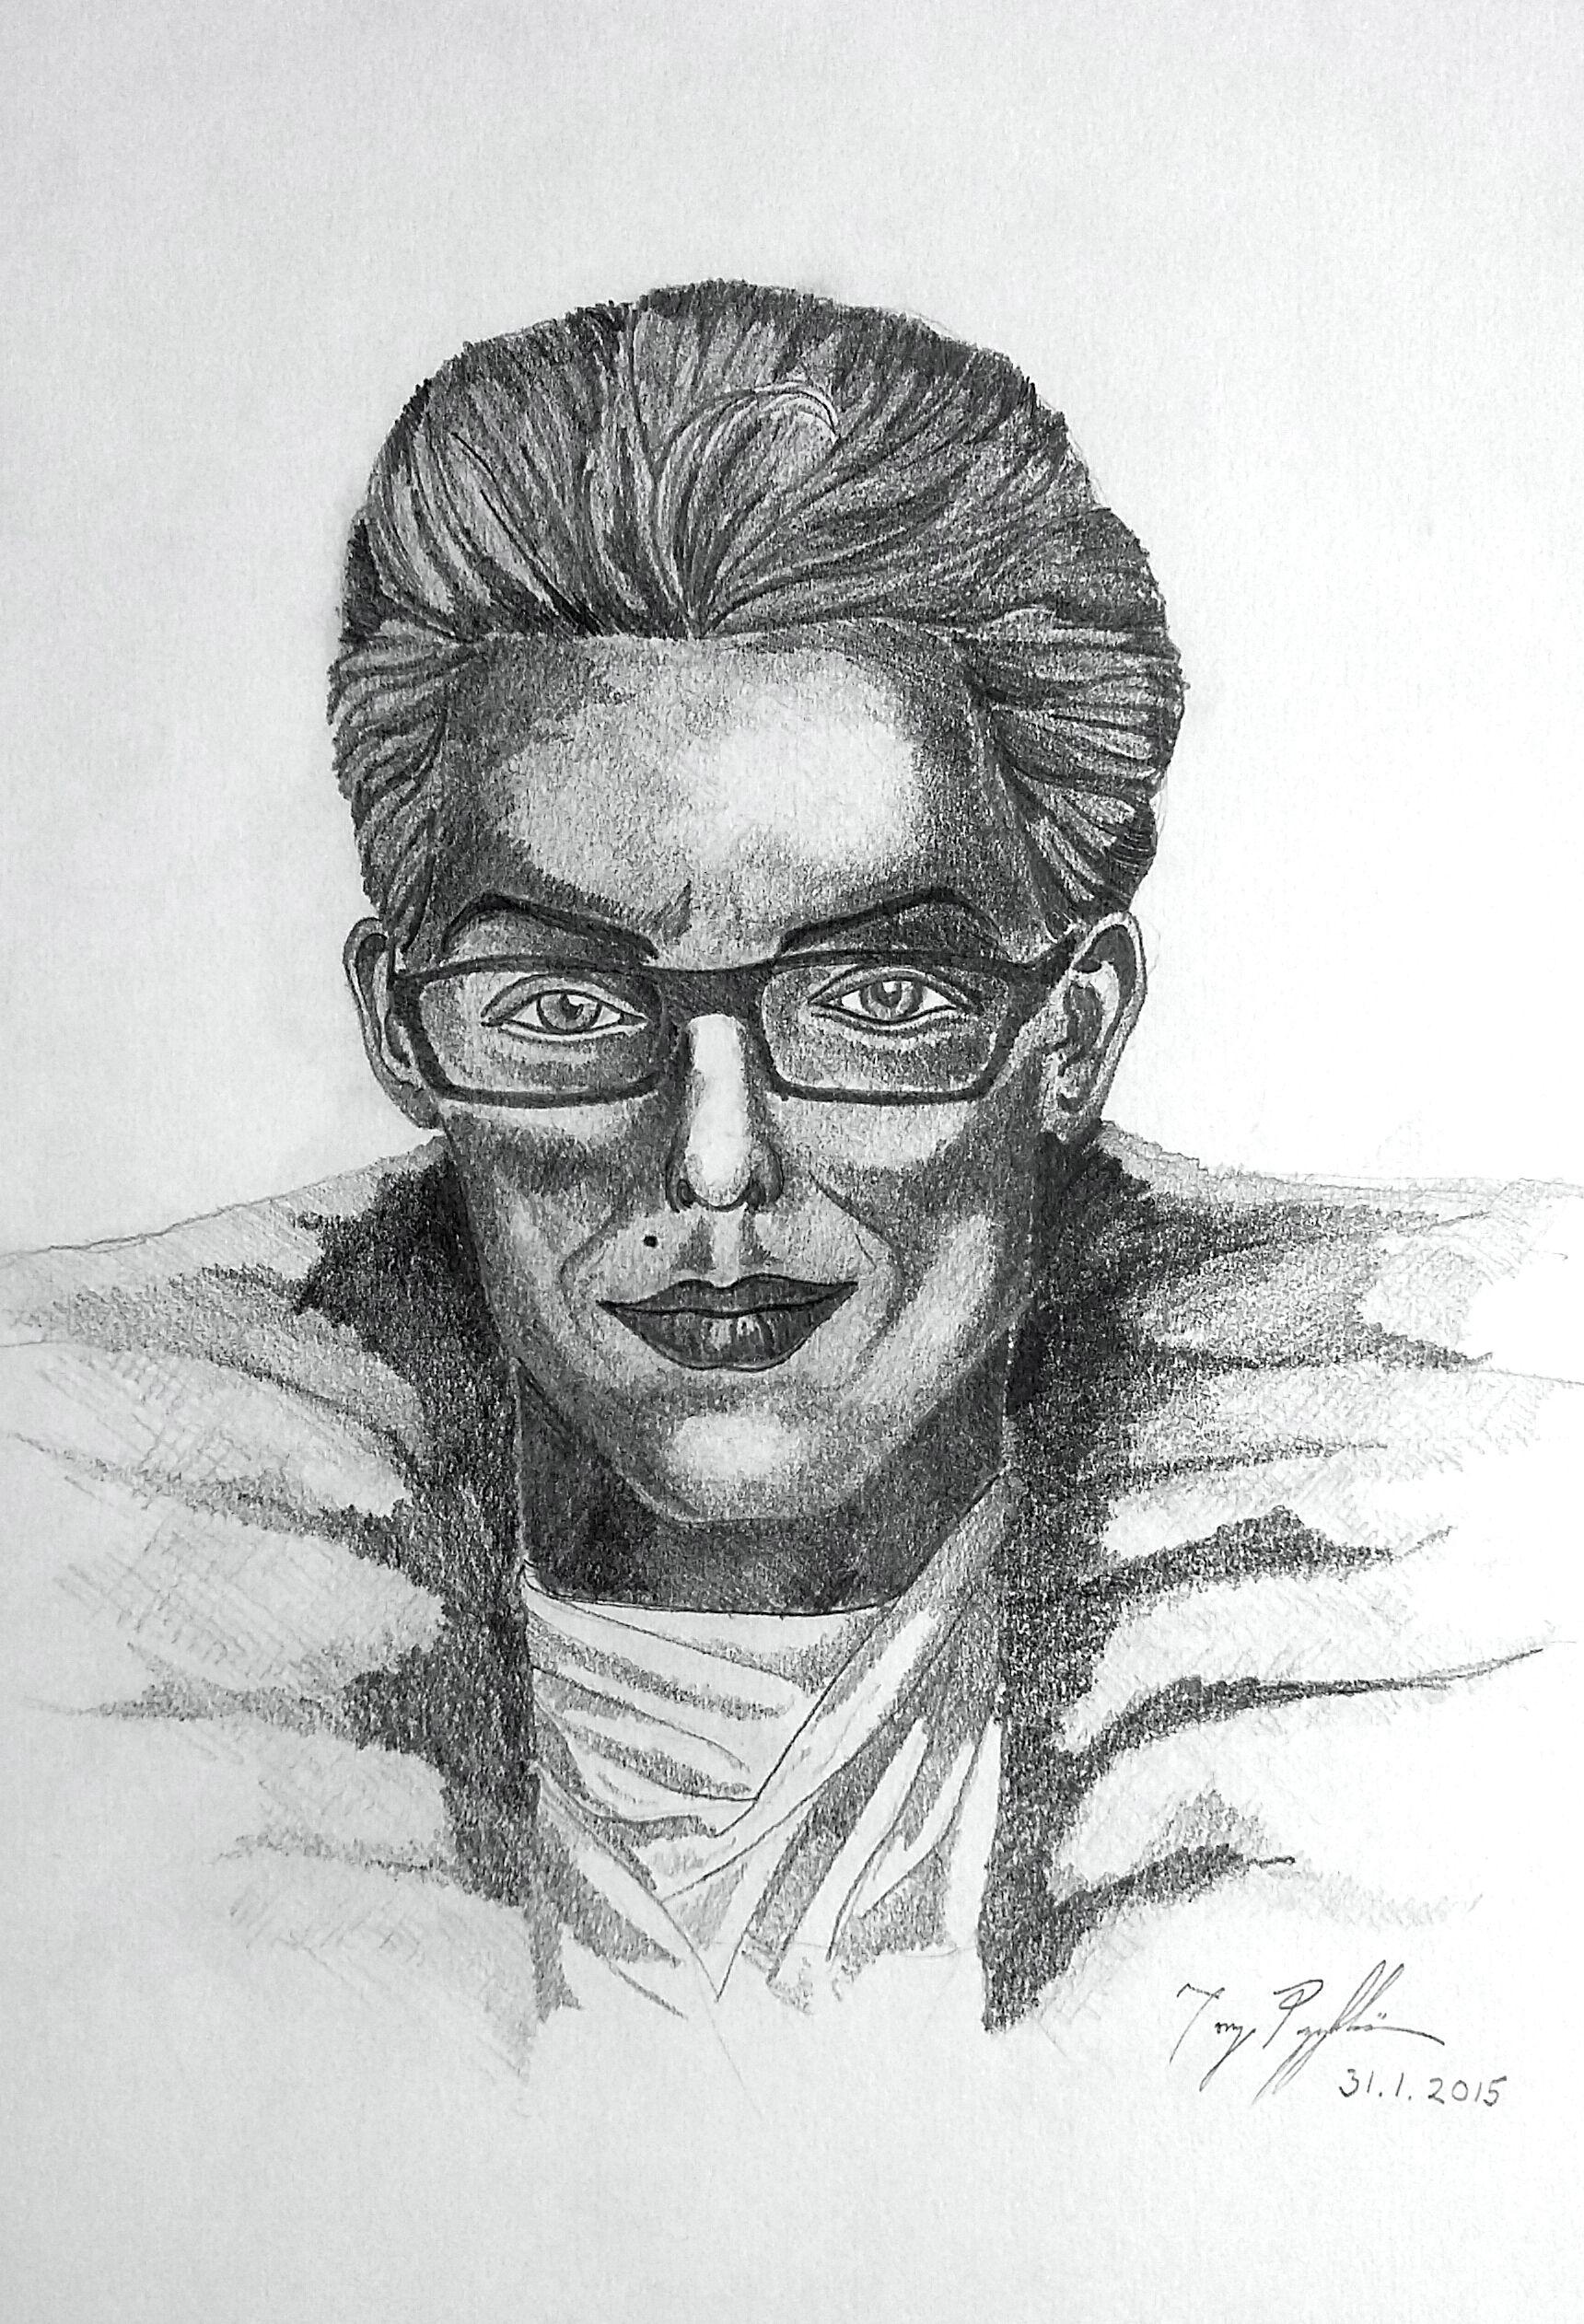 """Dramatic Self-portrait"", pencil on paper, 20x30cm, 2015"